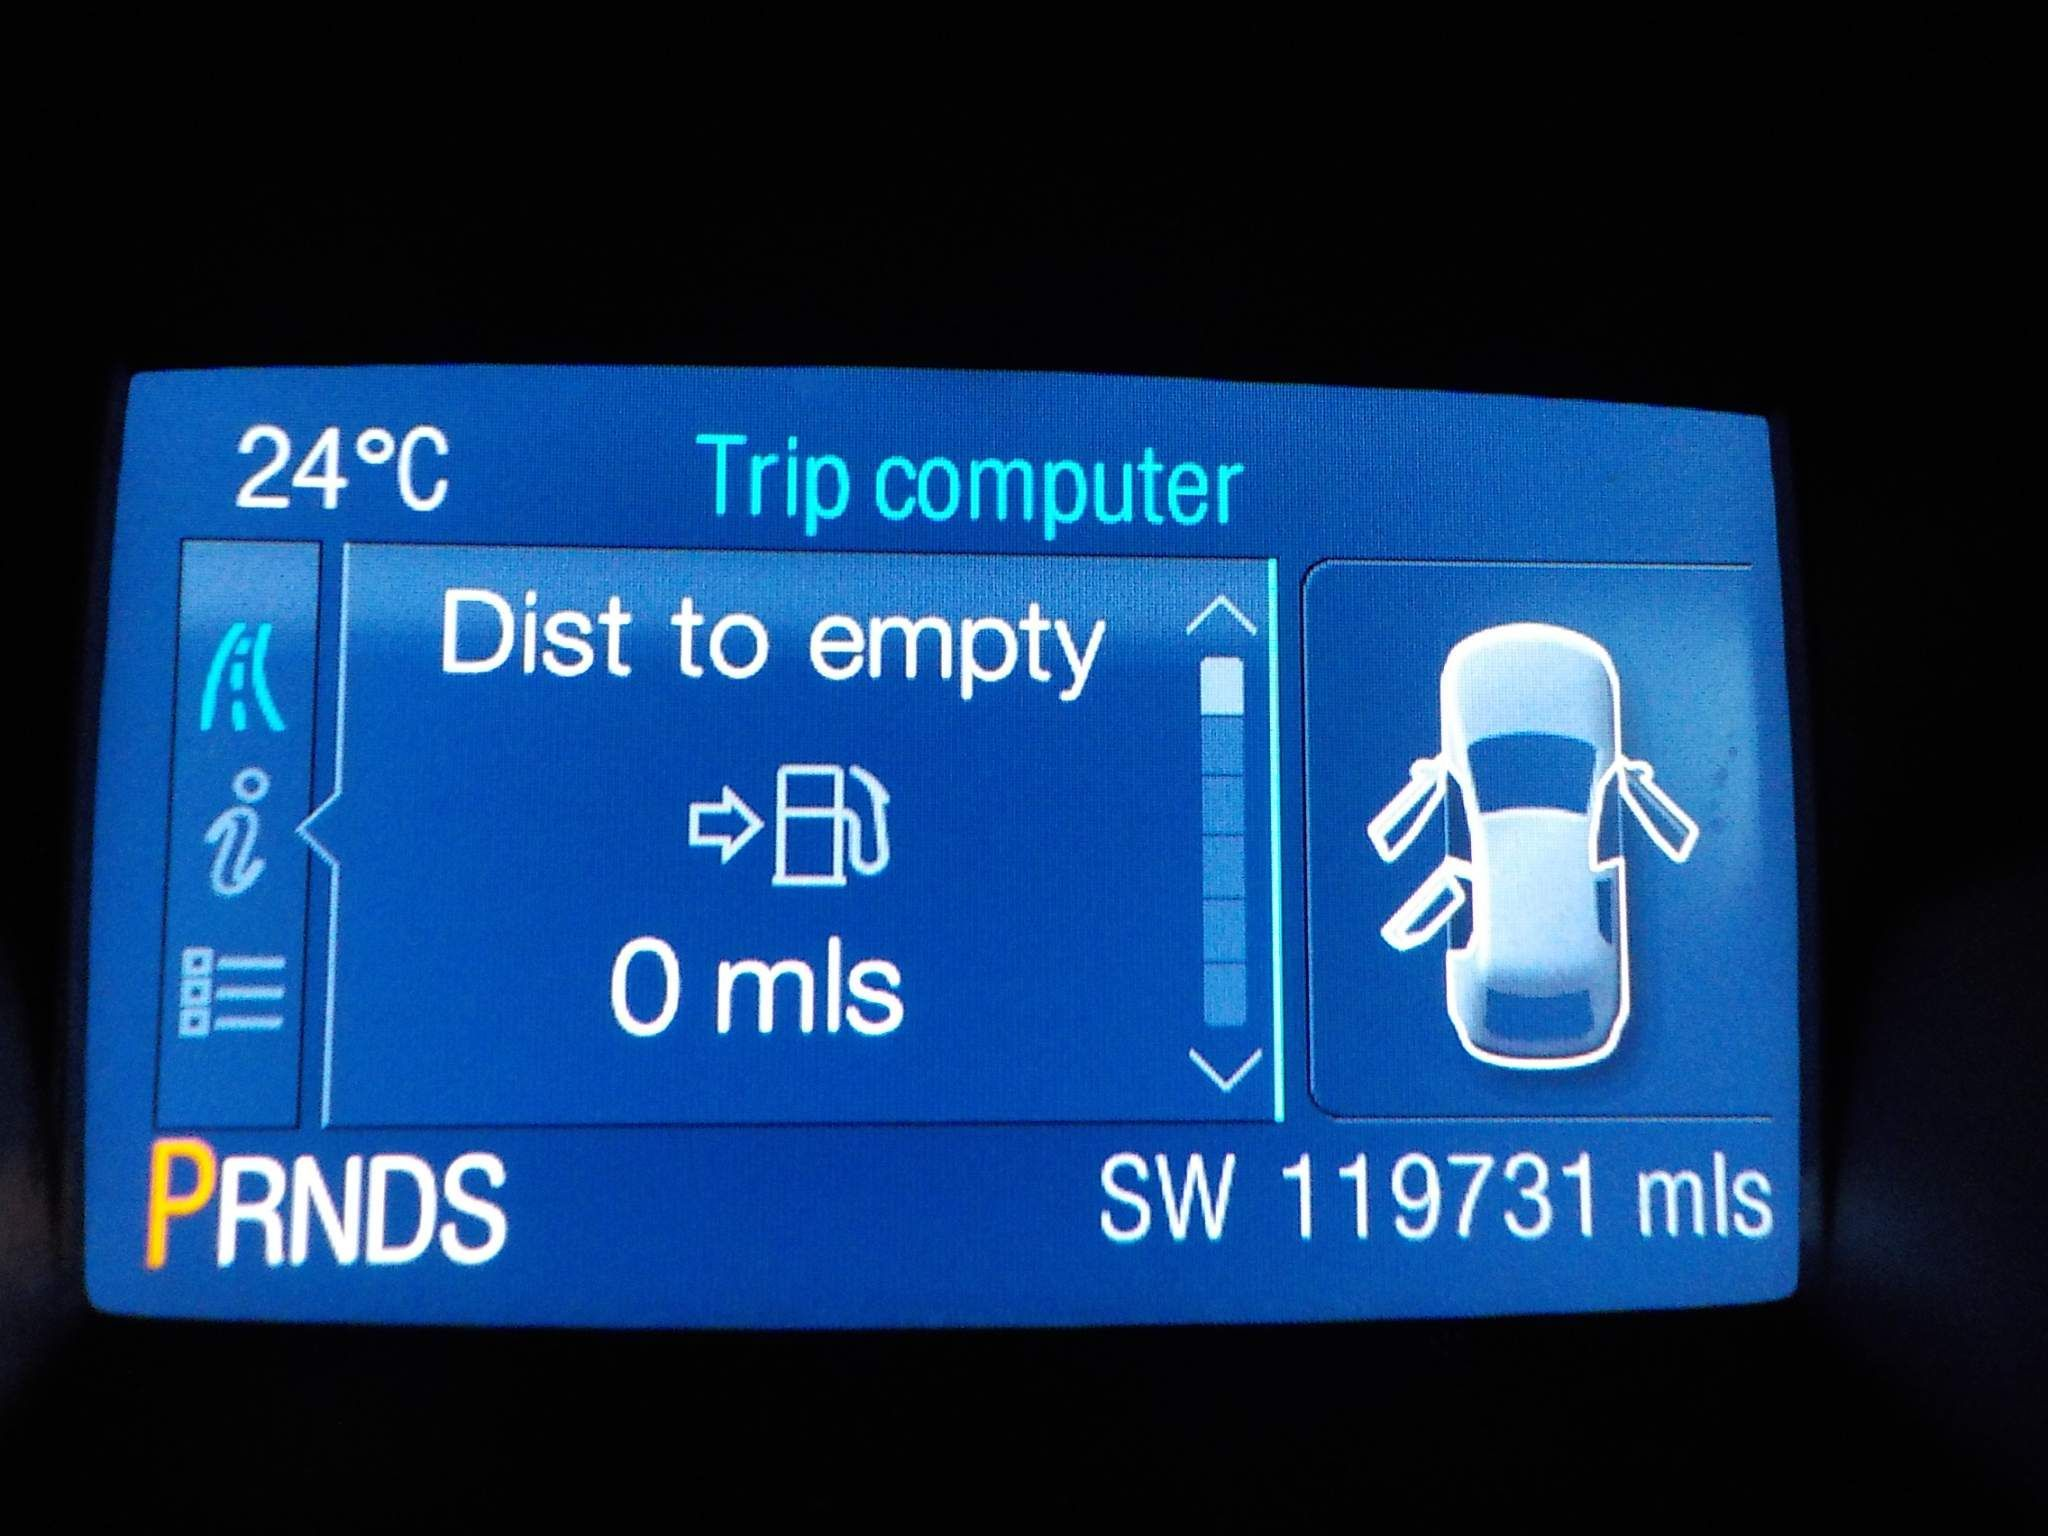 Ford Kuga 2.0 TDCi Zetec Powershift 4x4 5dr